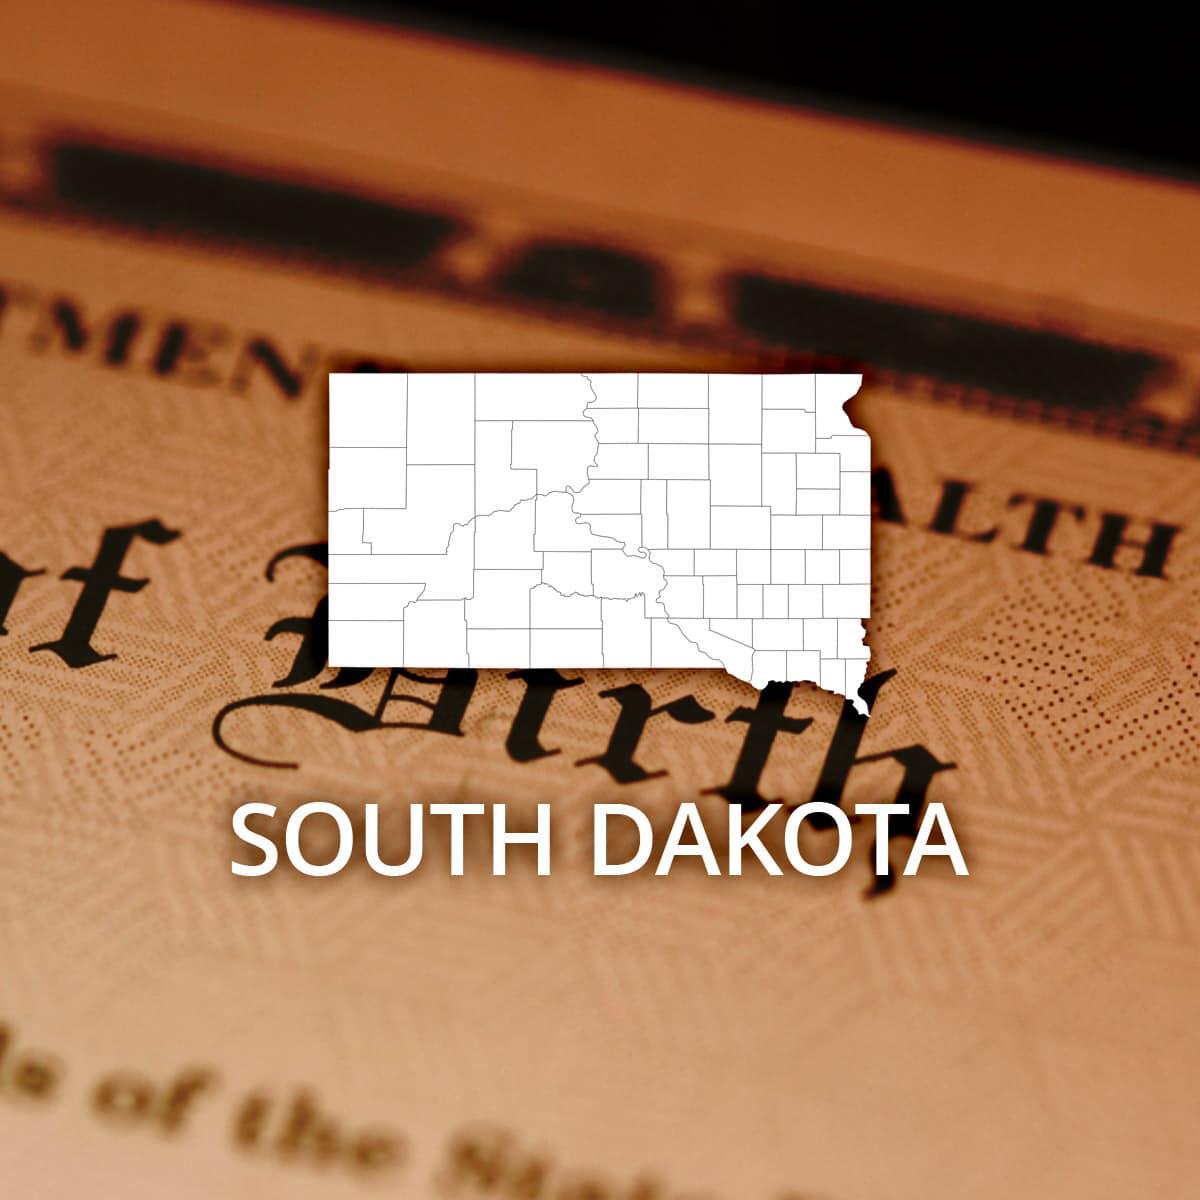 Where to Obtain a South Dakota Birth Certificate